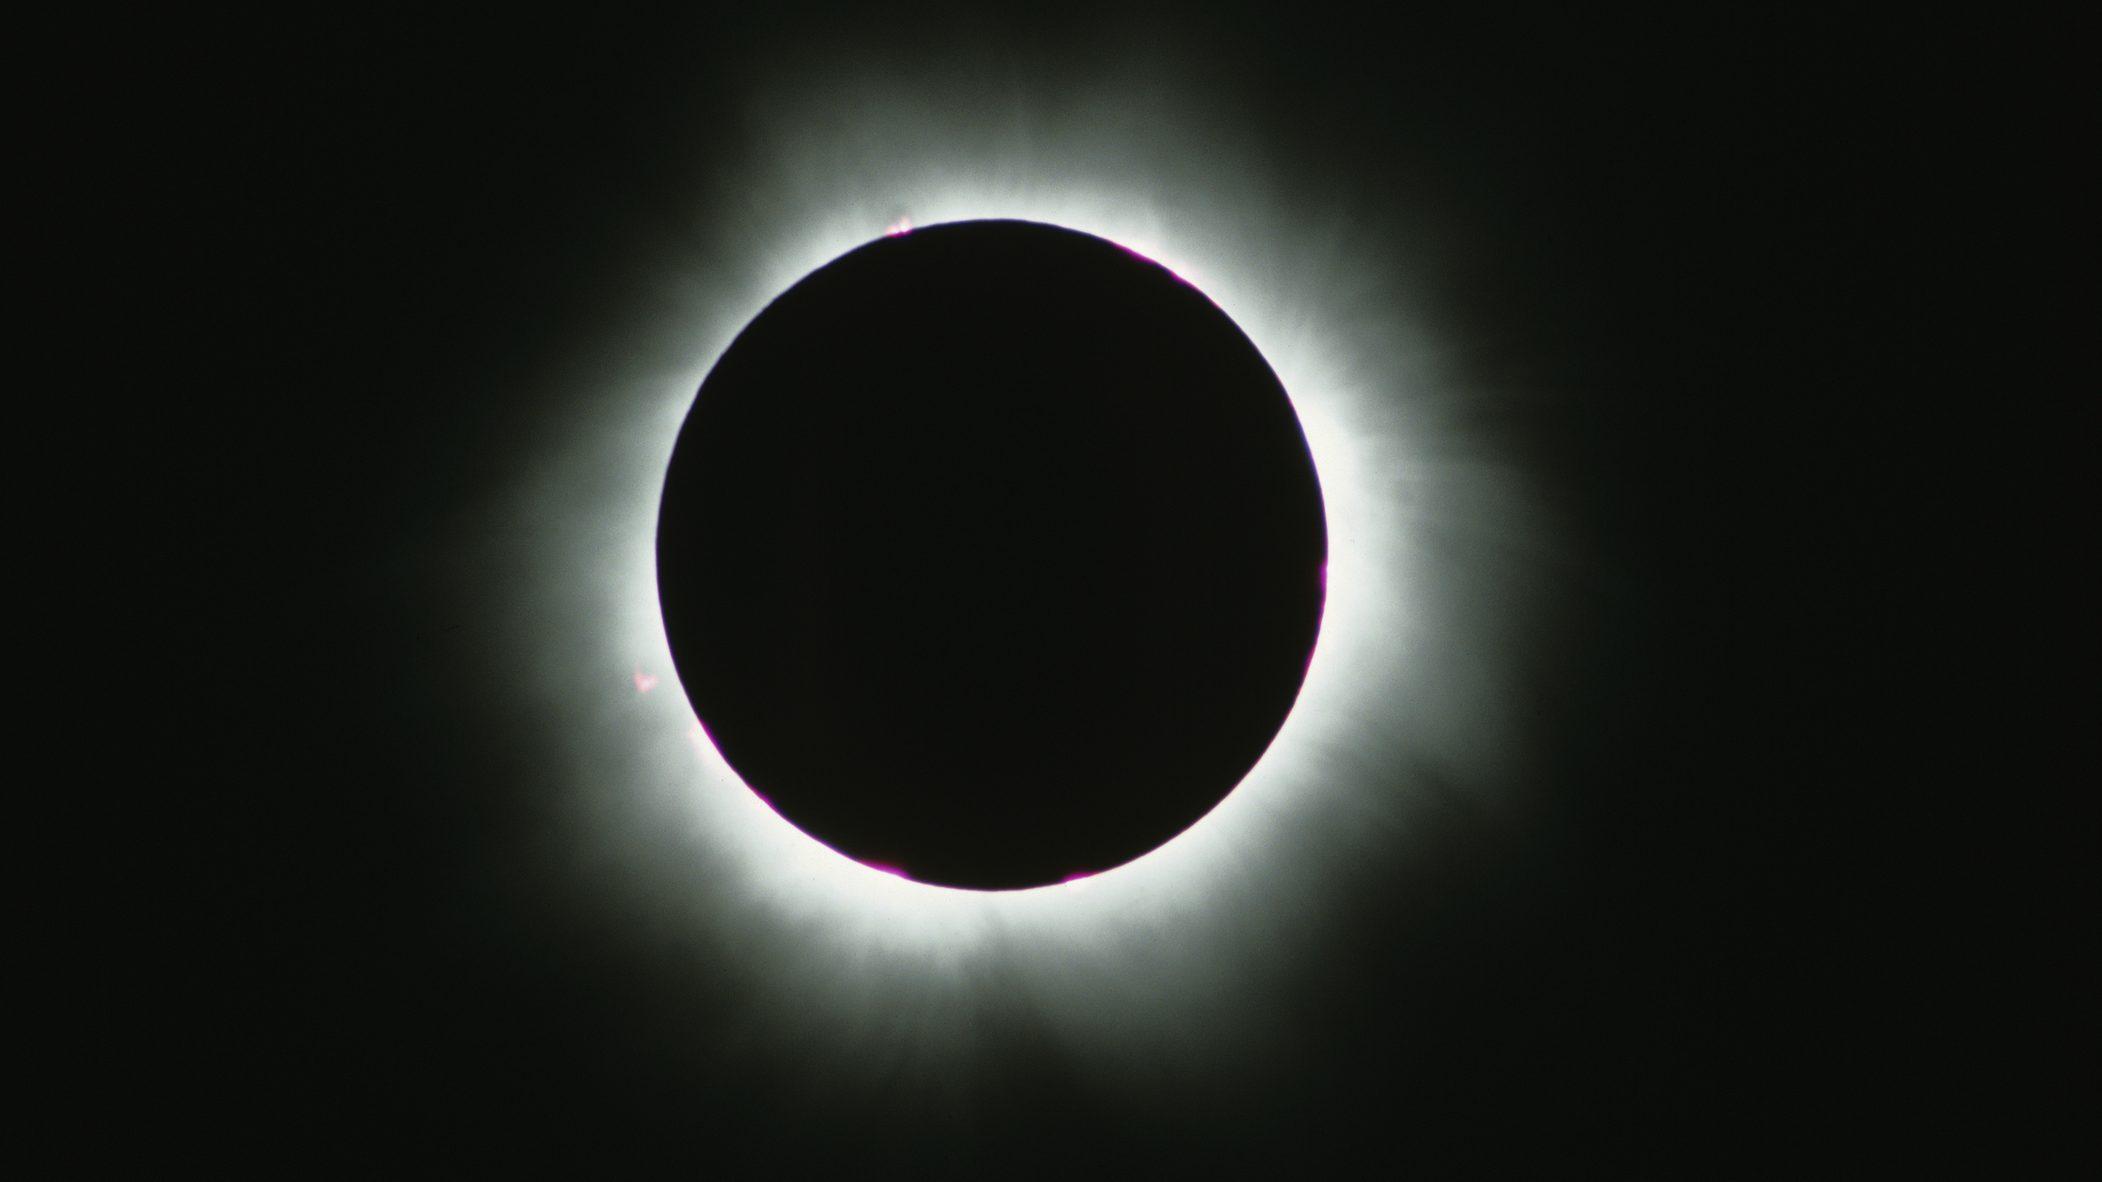 nasa live lunar eclipse - photo #12